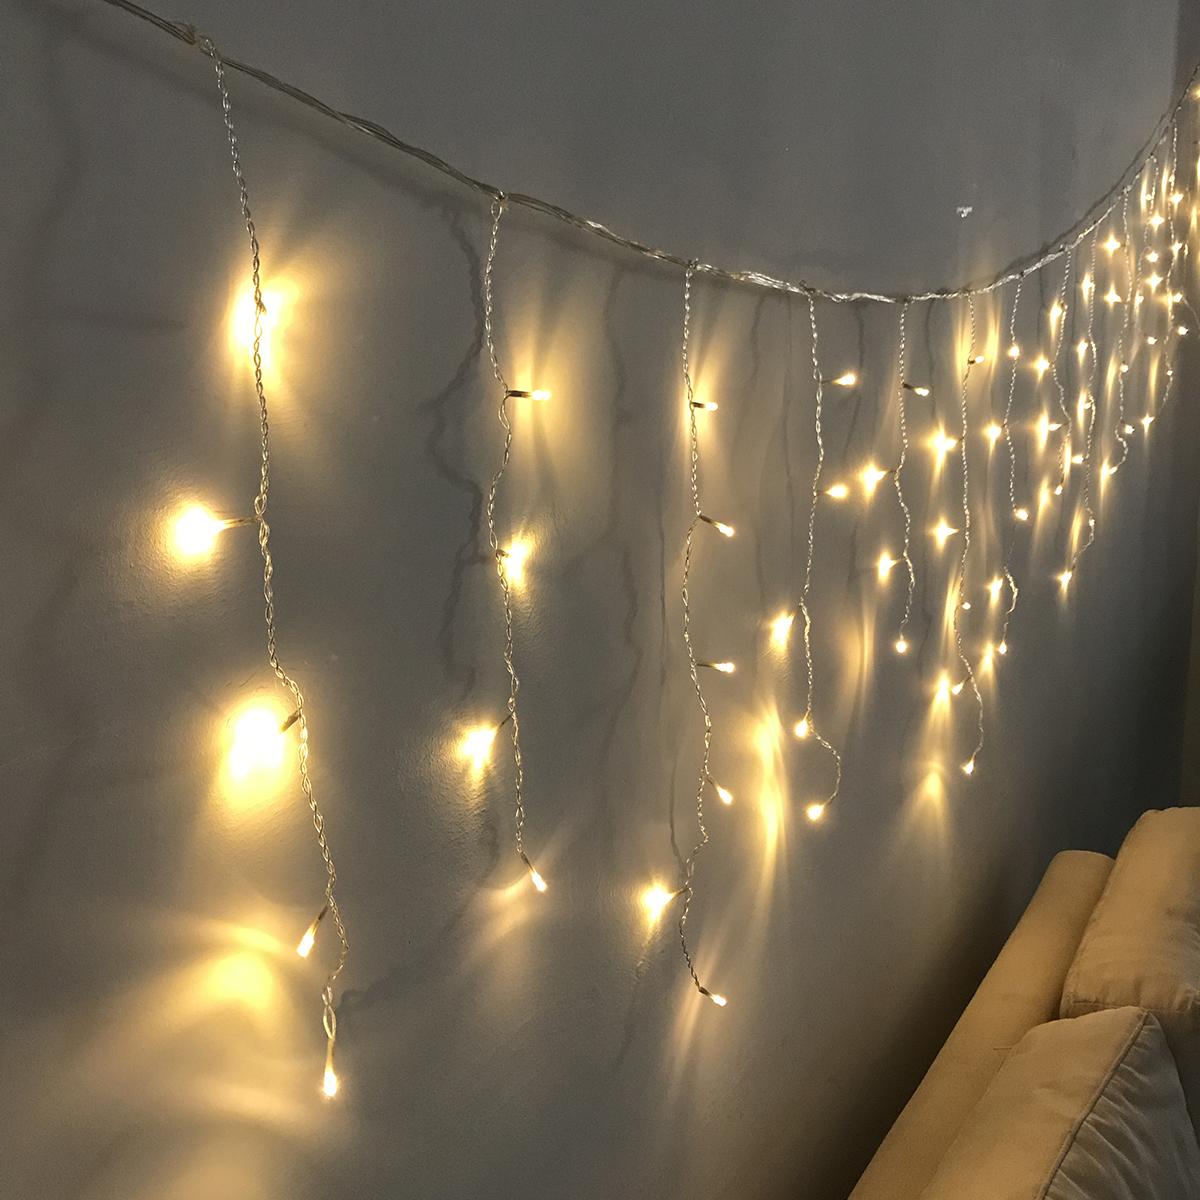 AC220V 2M*0.6M LED Curtain String Light Holiday Christmas Home Warm White Lamp US Plug